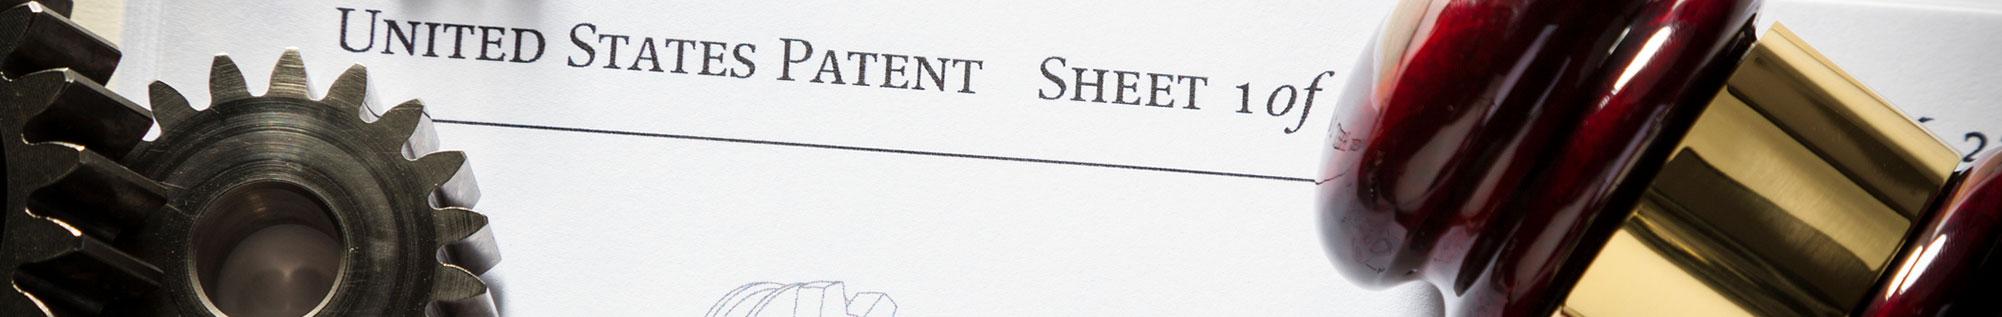 united states patent document